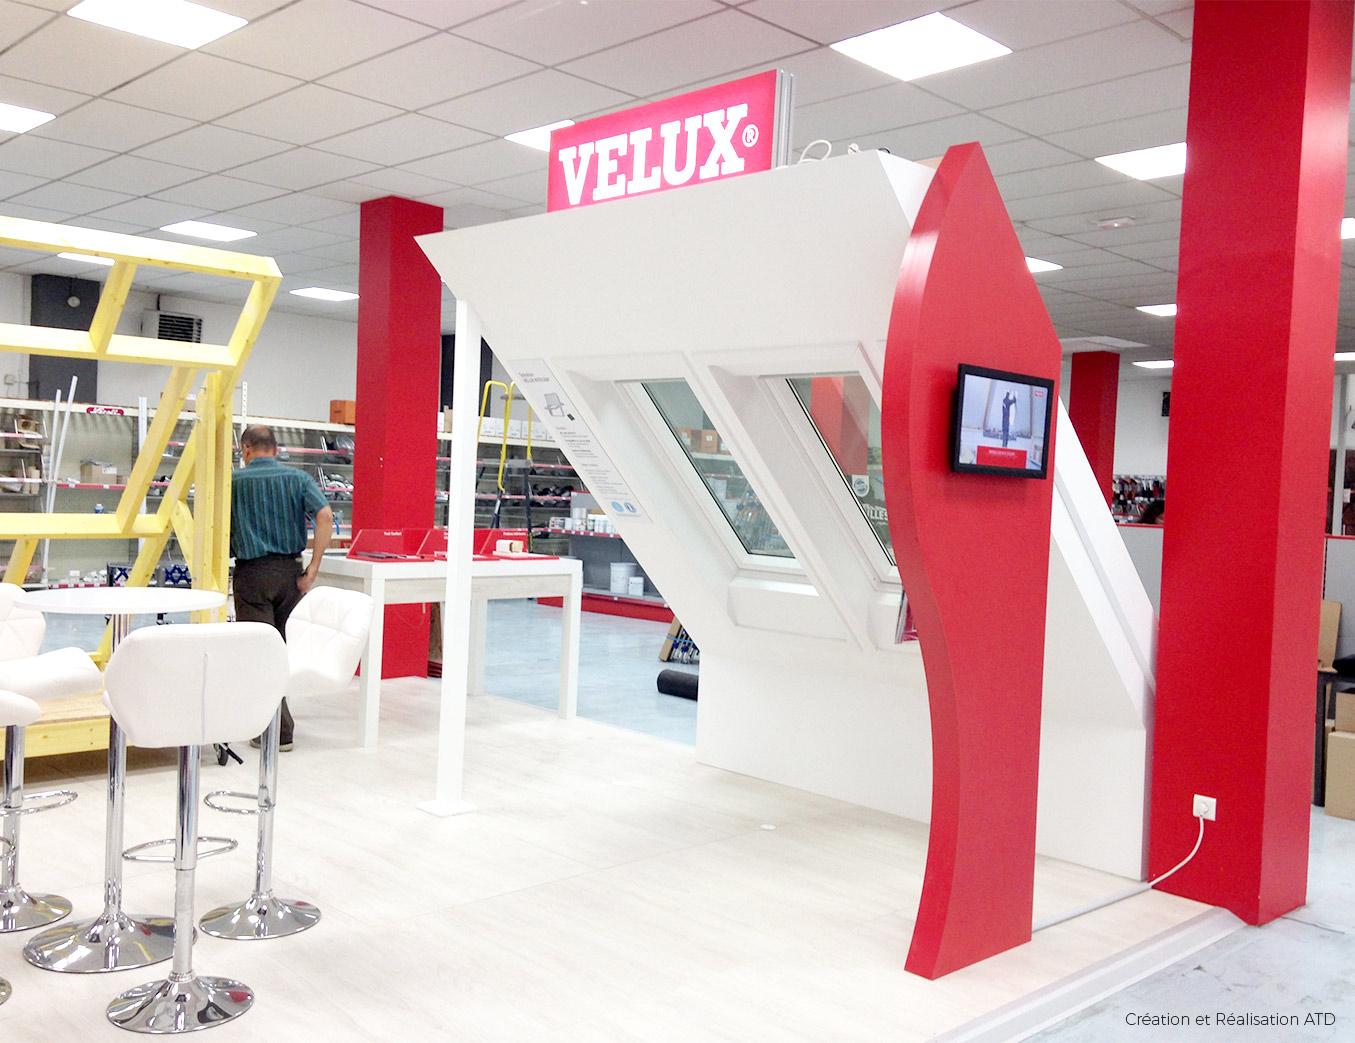 Velux Reference dedans velux corner de vente - alphonse tari design